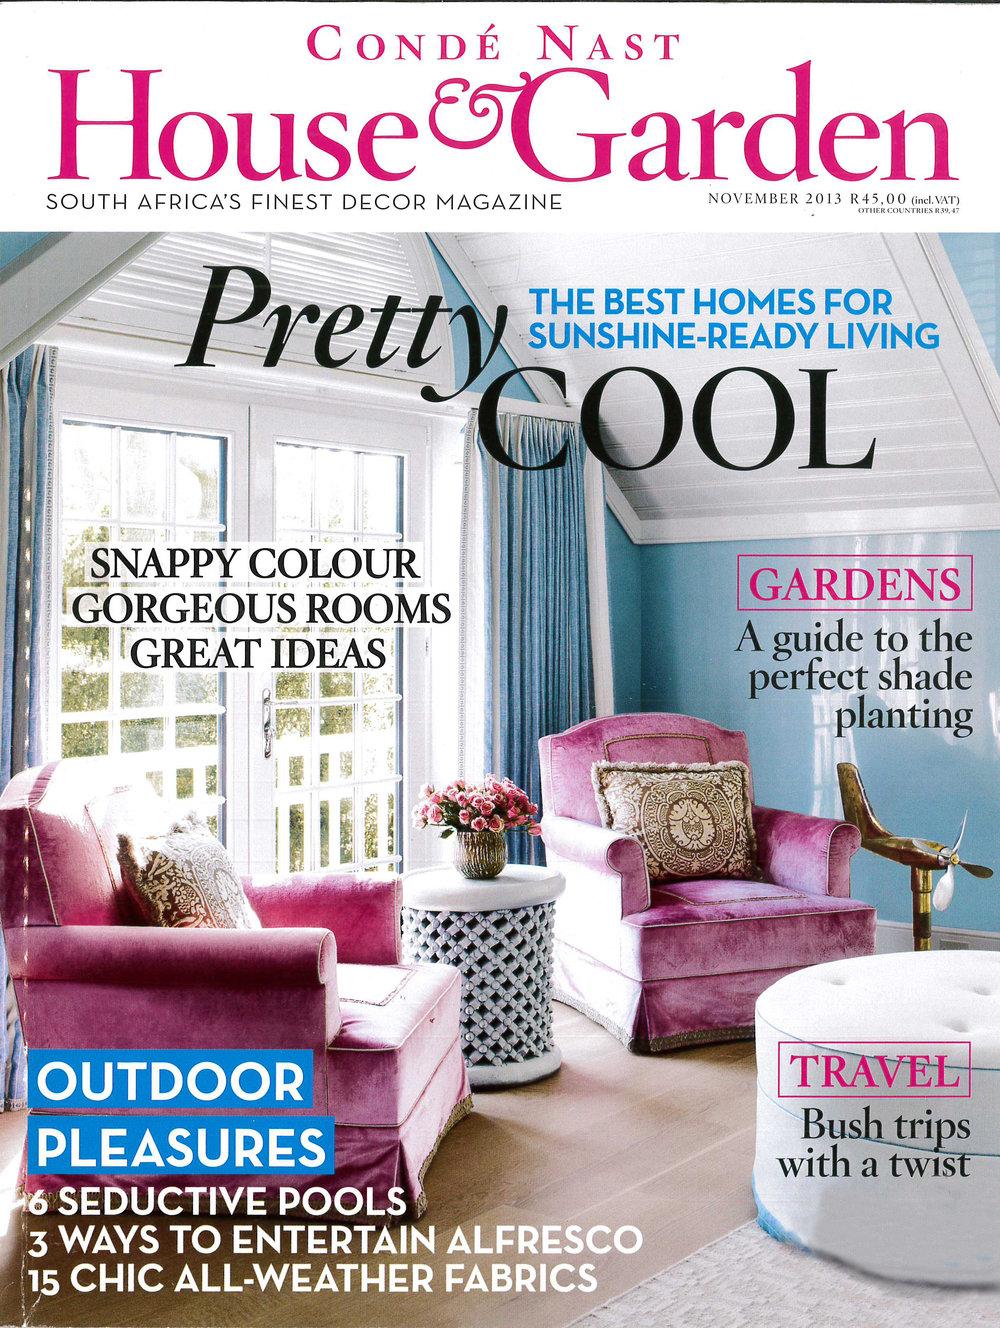 90f3d-house-garden-south-africa-cover-edited.jpg